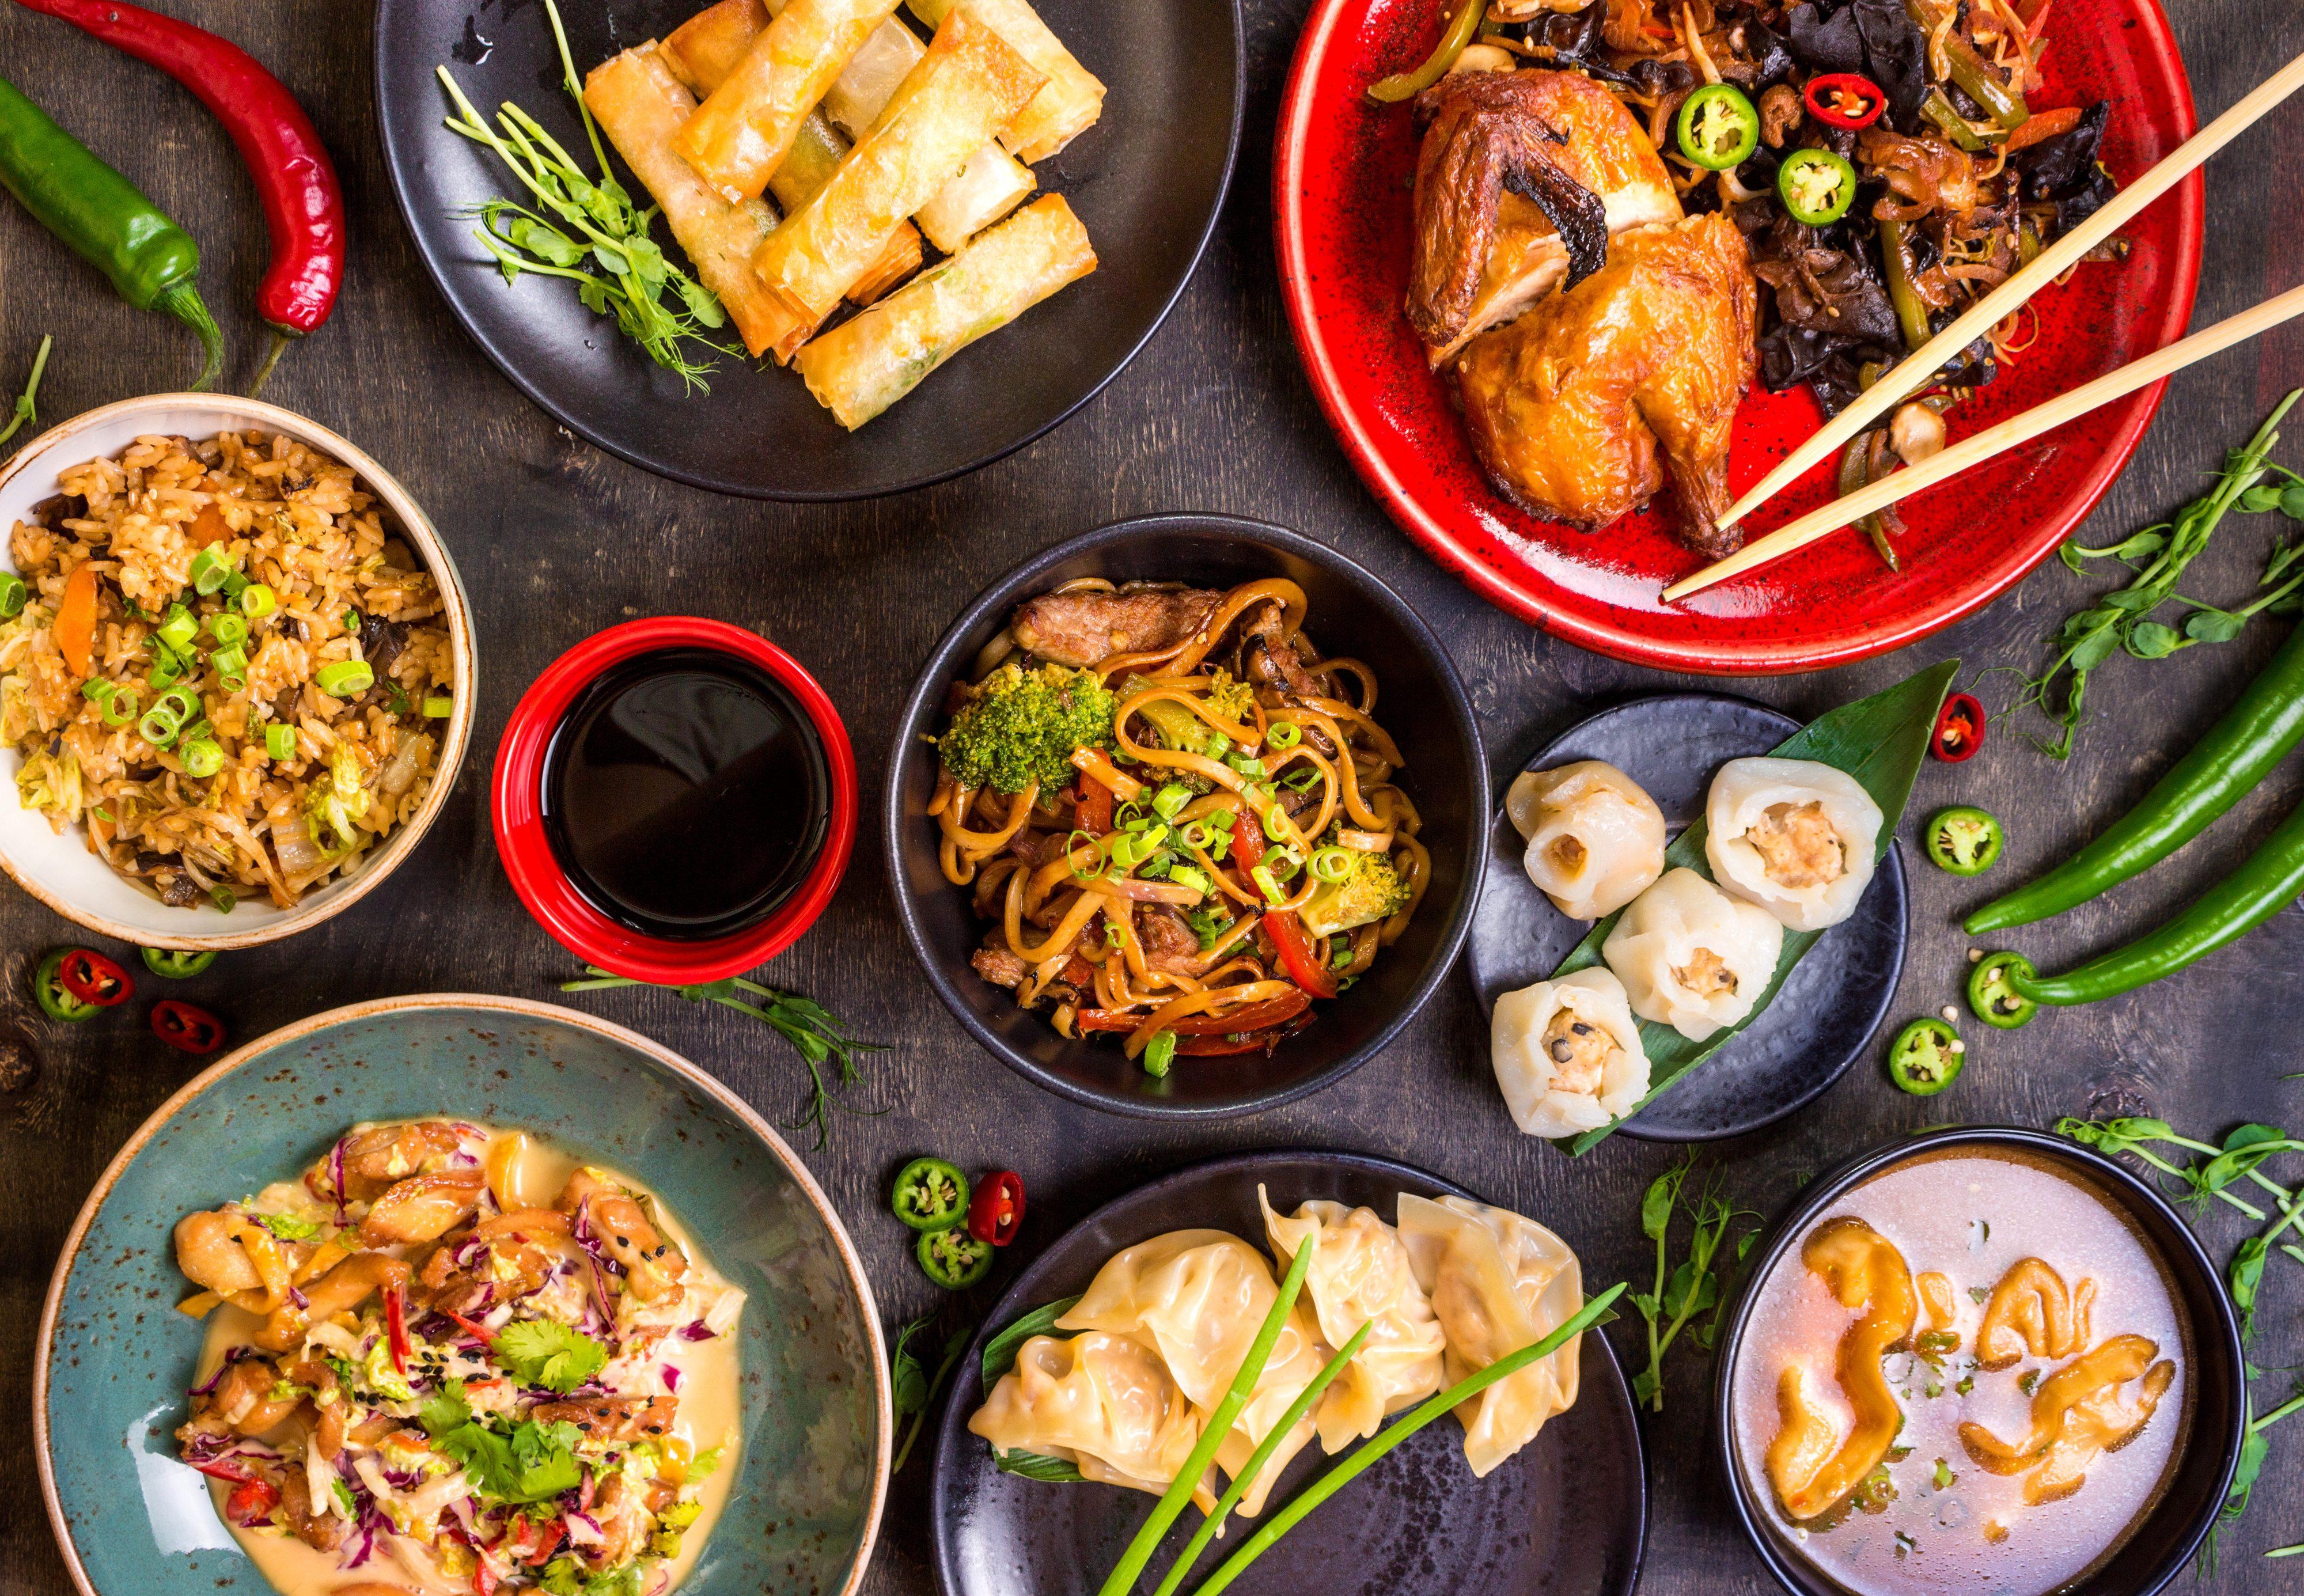 I migliori ristoranti cinesi in Italia: 10 indirizzi per scoprire la cucina cinese